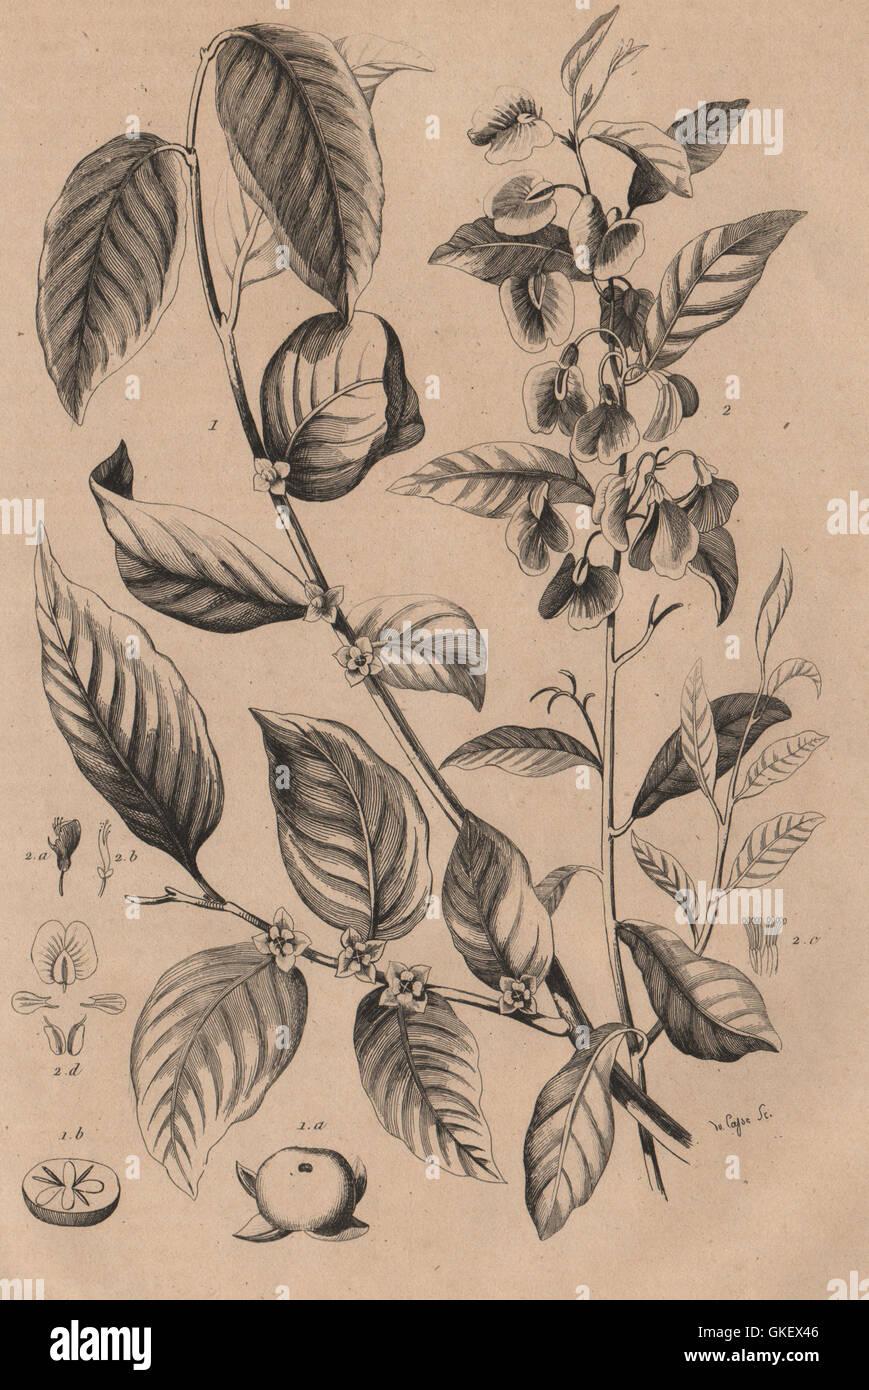 PLANTS: Plaqueminier (Persimmon). Platychilier, antique print 1834 - Stock Image